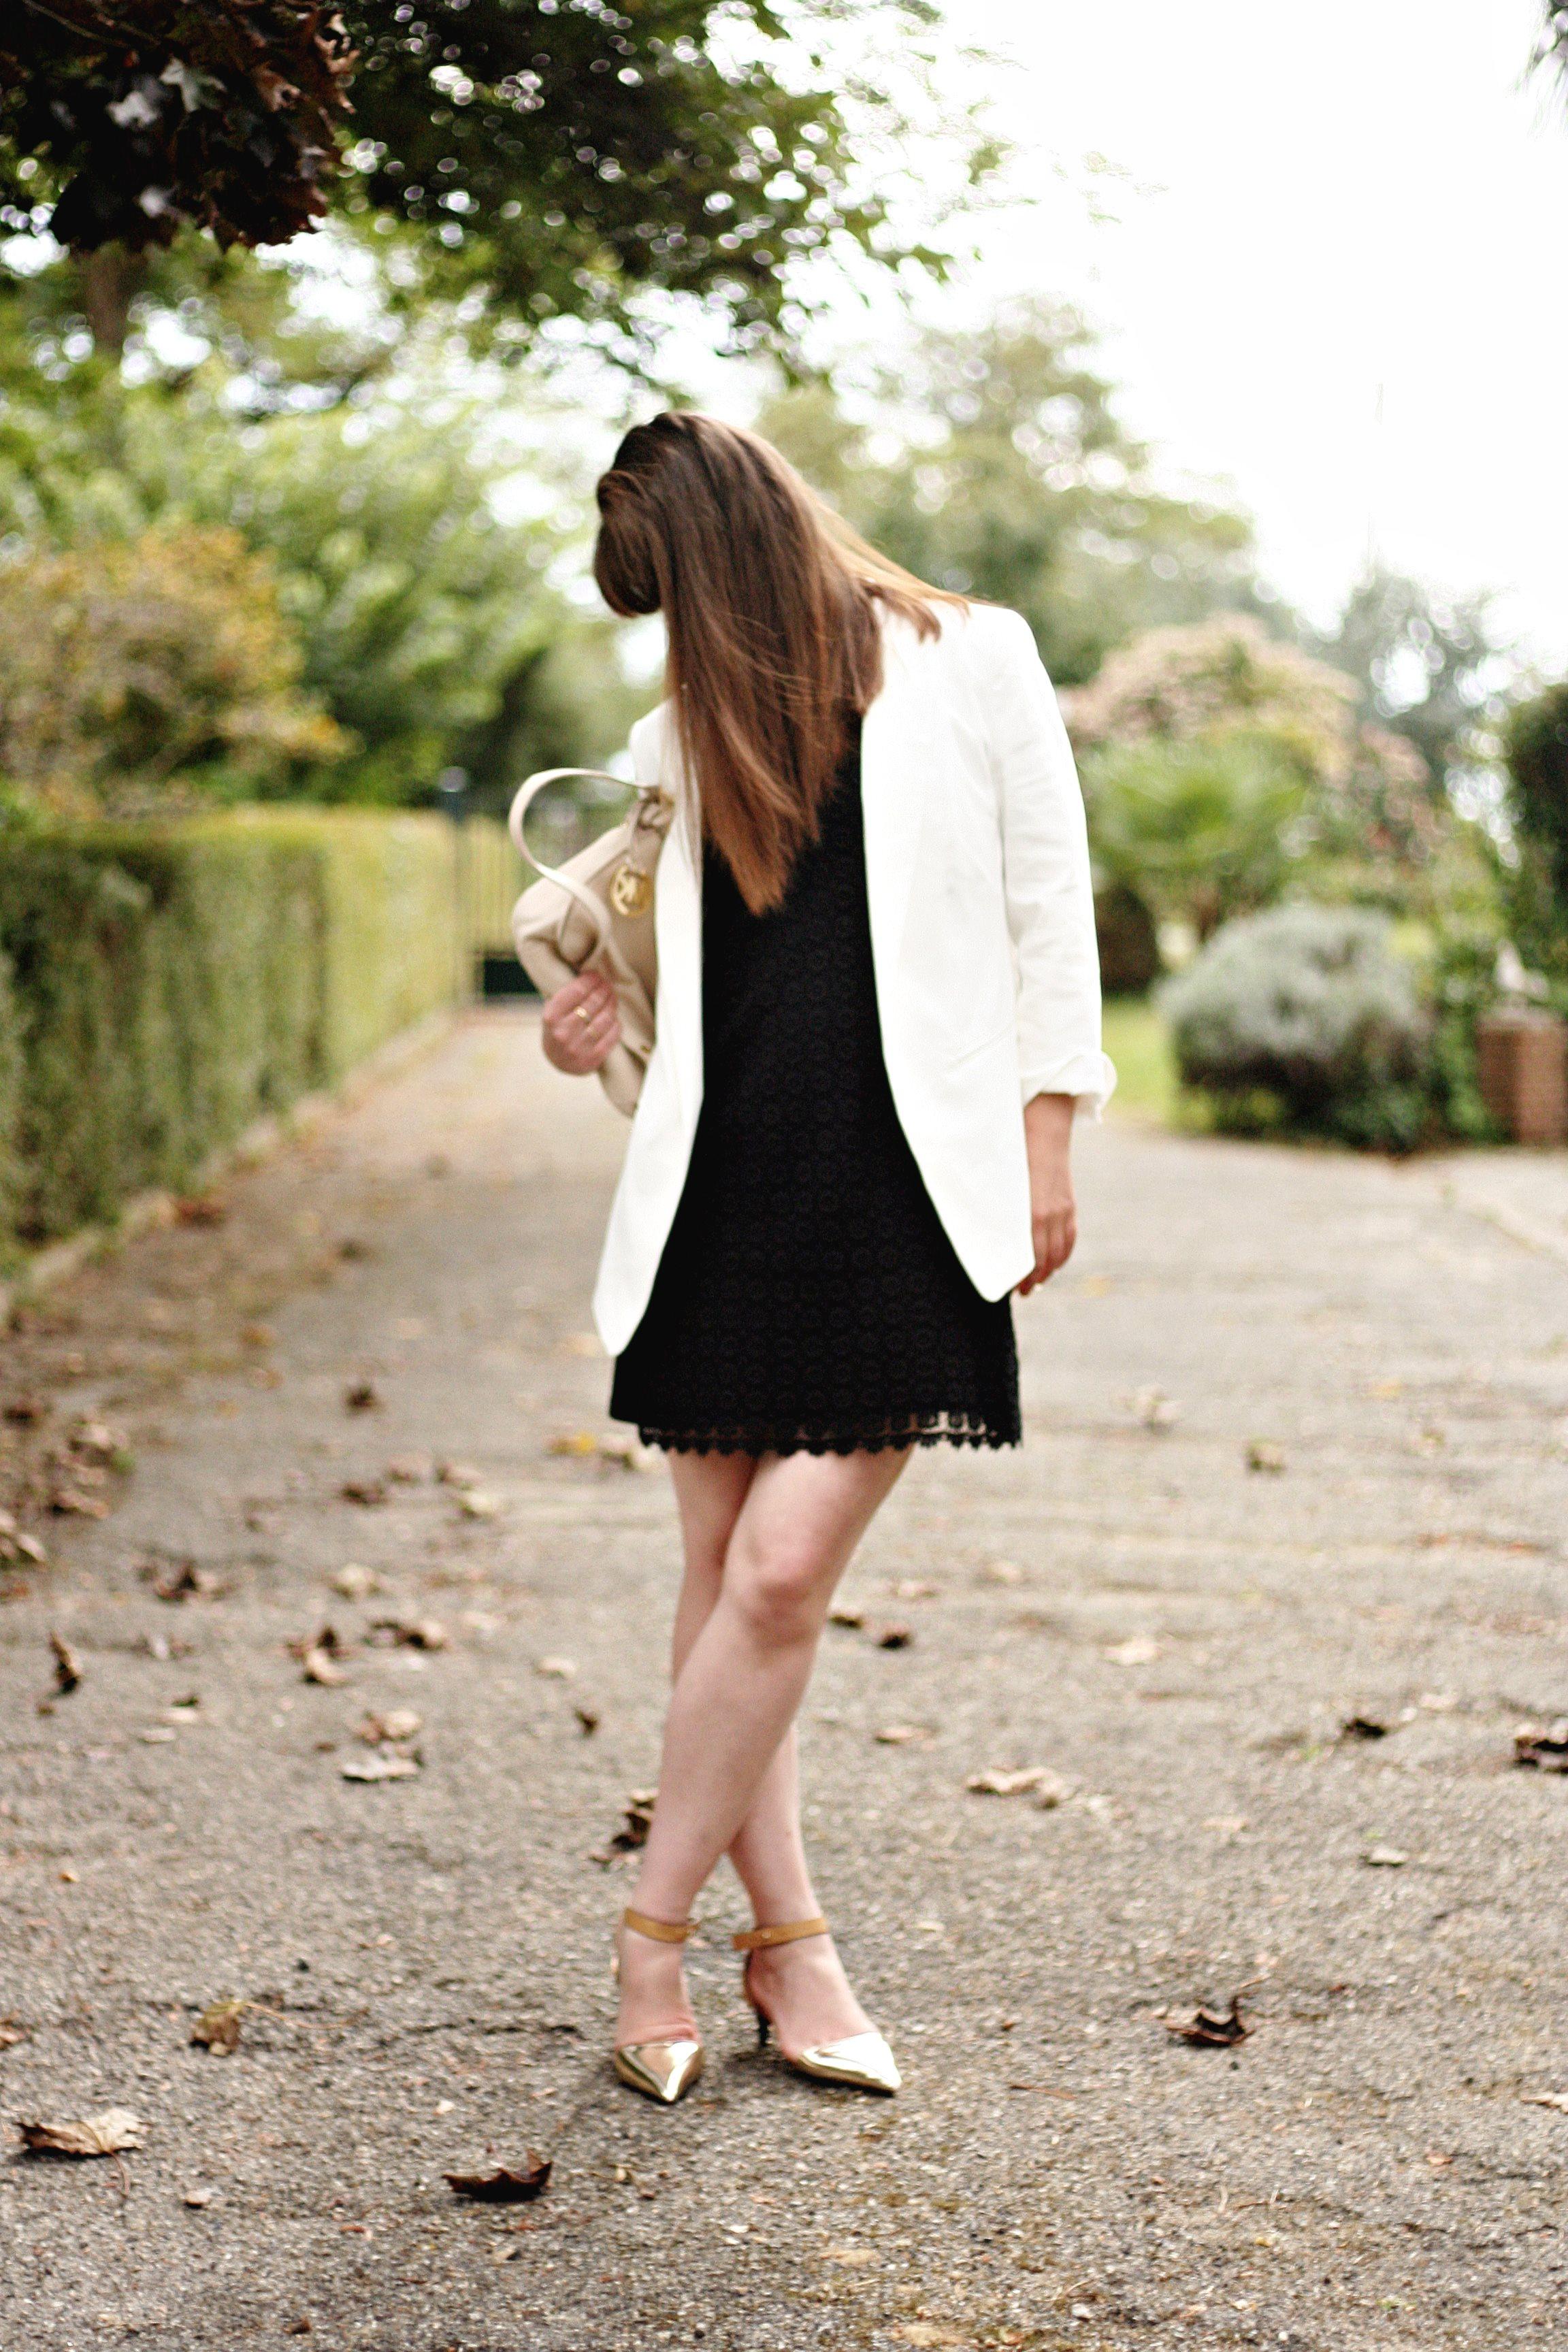 tenues chics week end robe style 60 dentelle retro michael kors sac